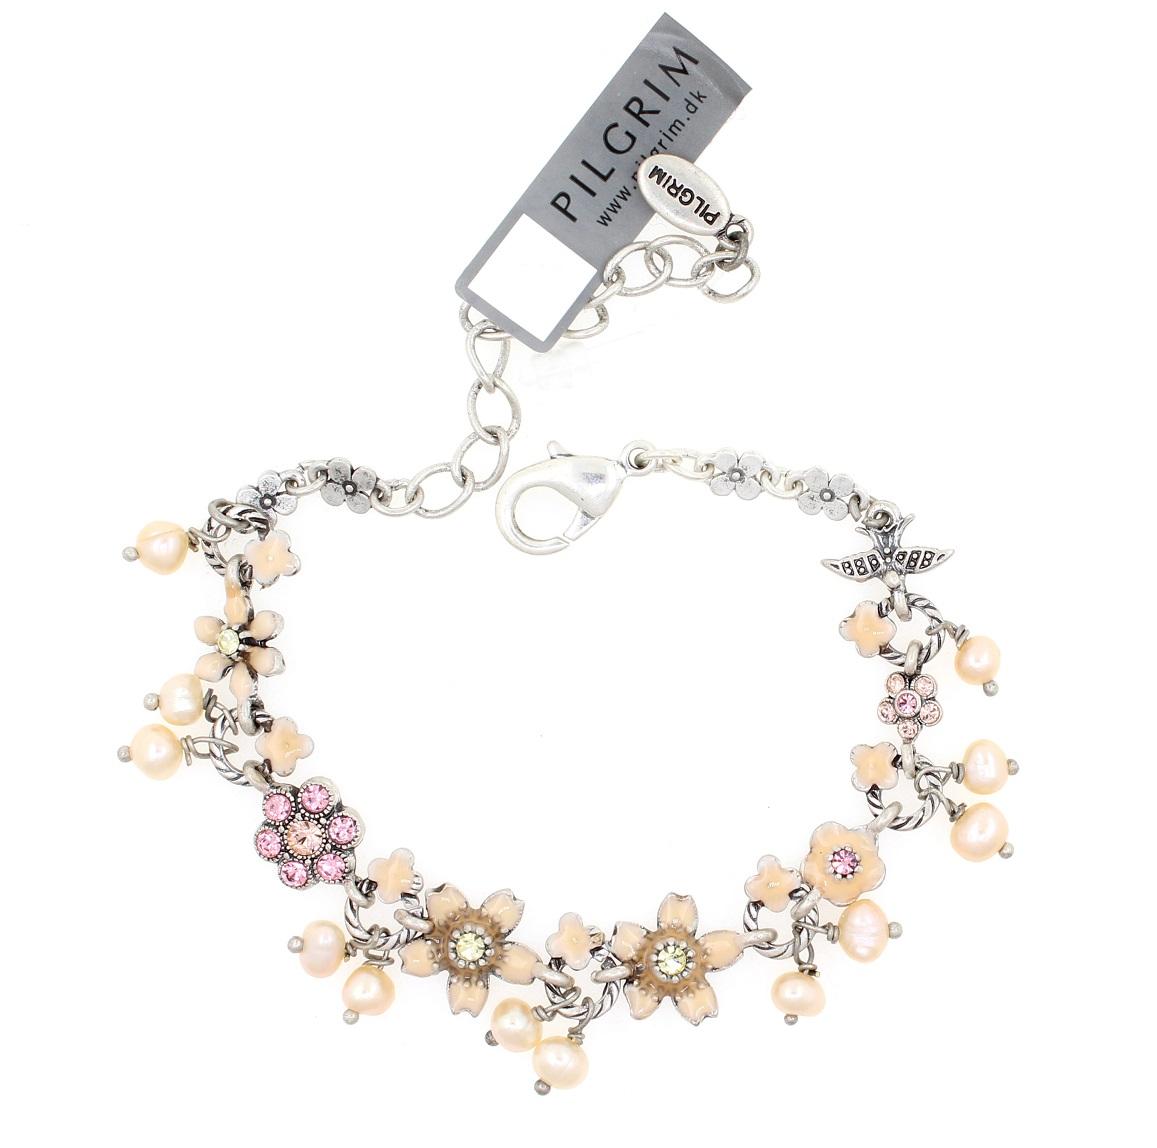 PILGRIM - Swallows & Flowers - Bracelet - Oxidised Silver/Pink BNWT